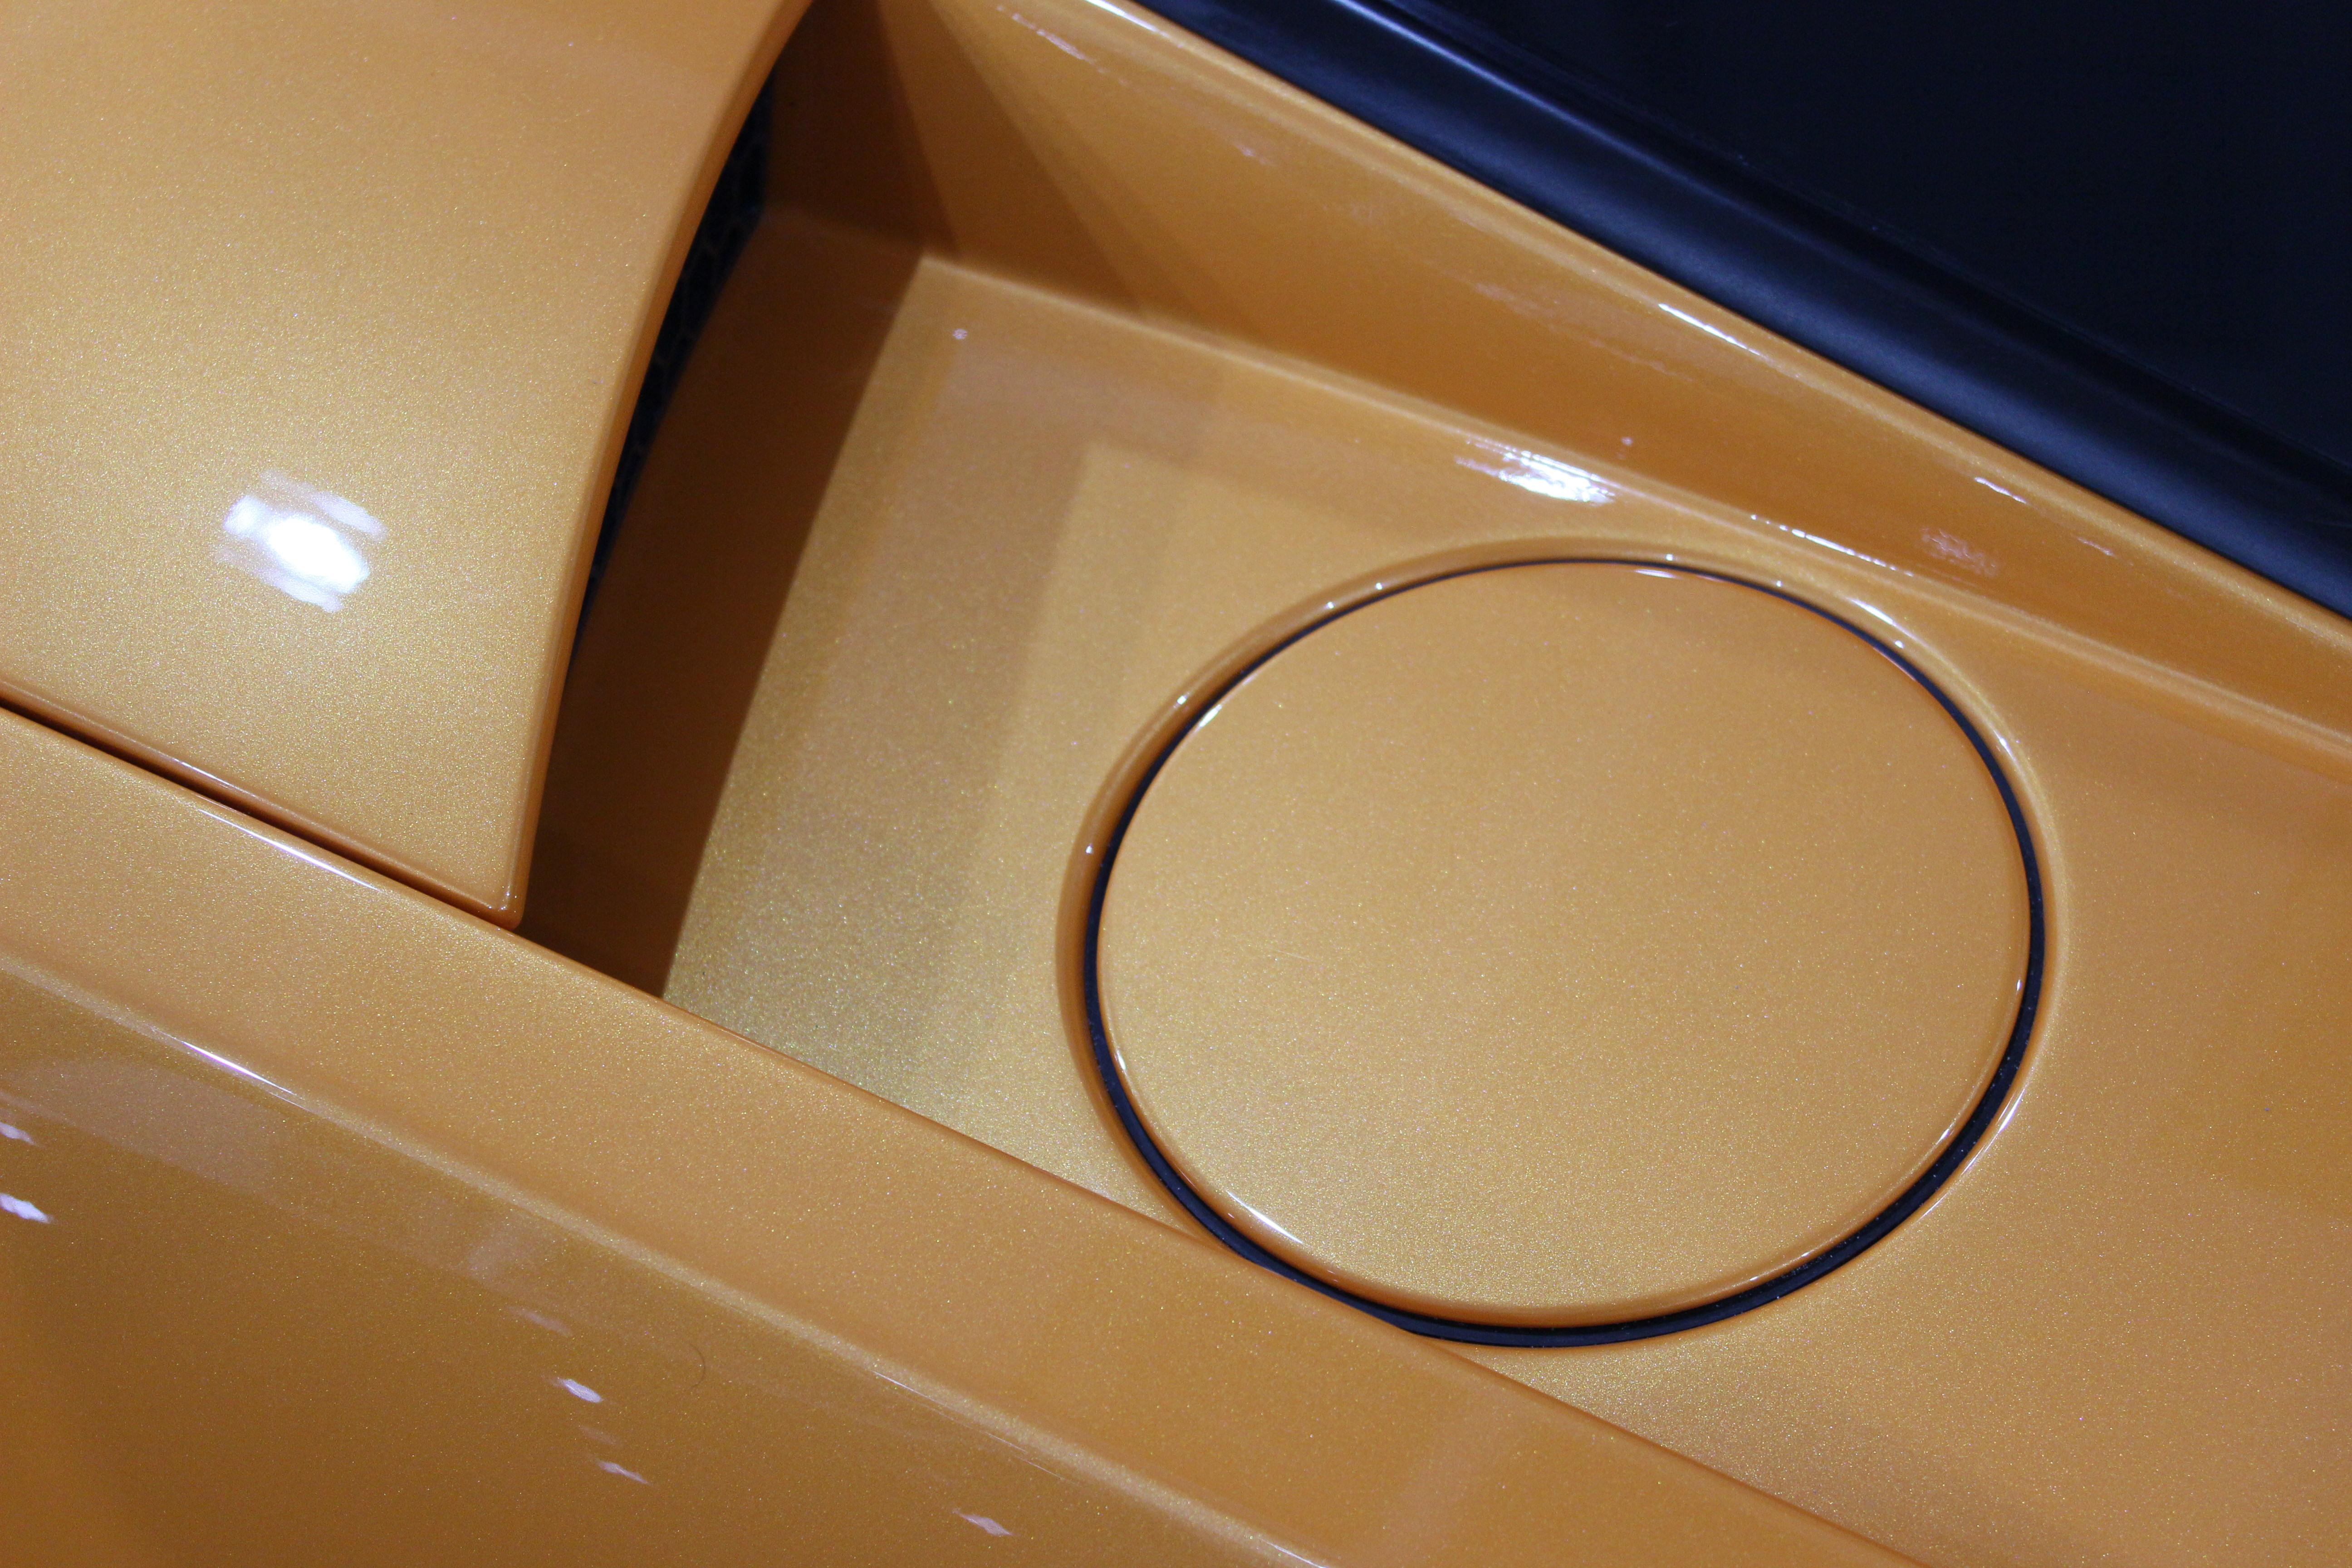 Pics Of Lamborghini Gallardo - New Car Reviews and Specs ...